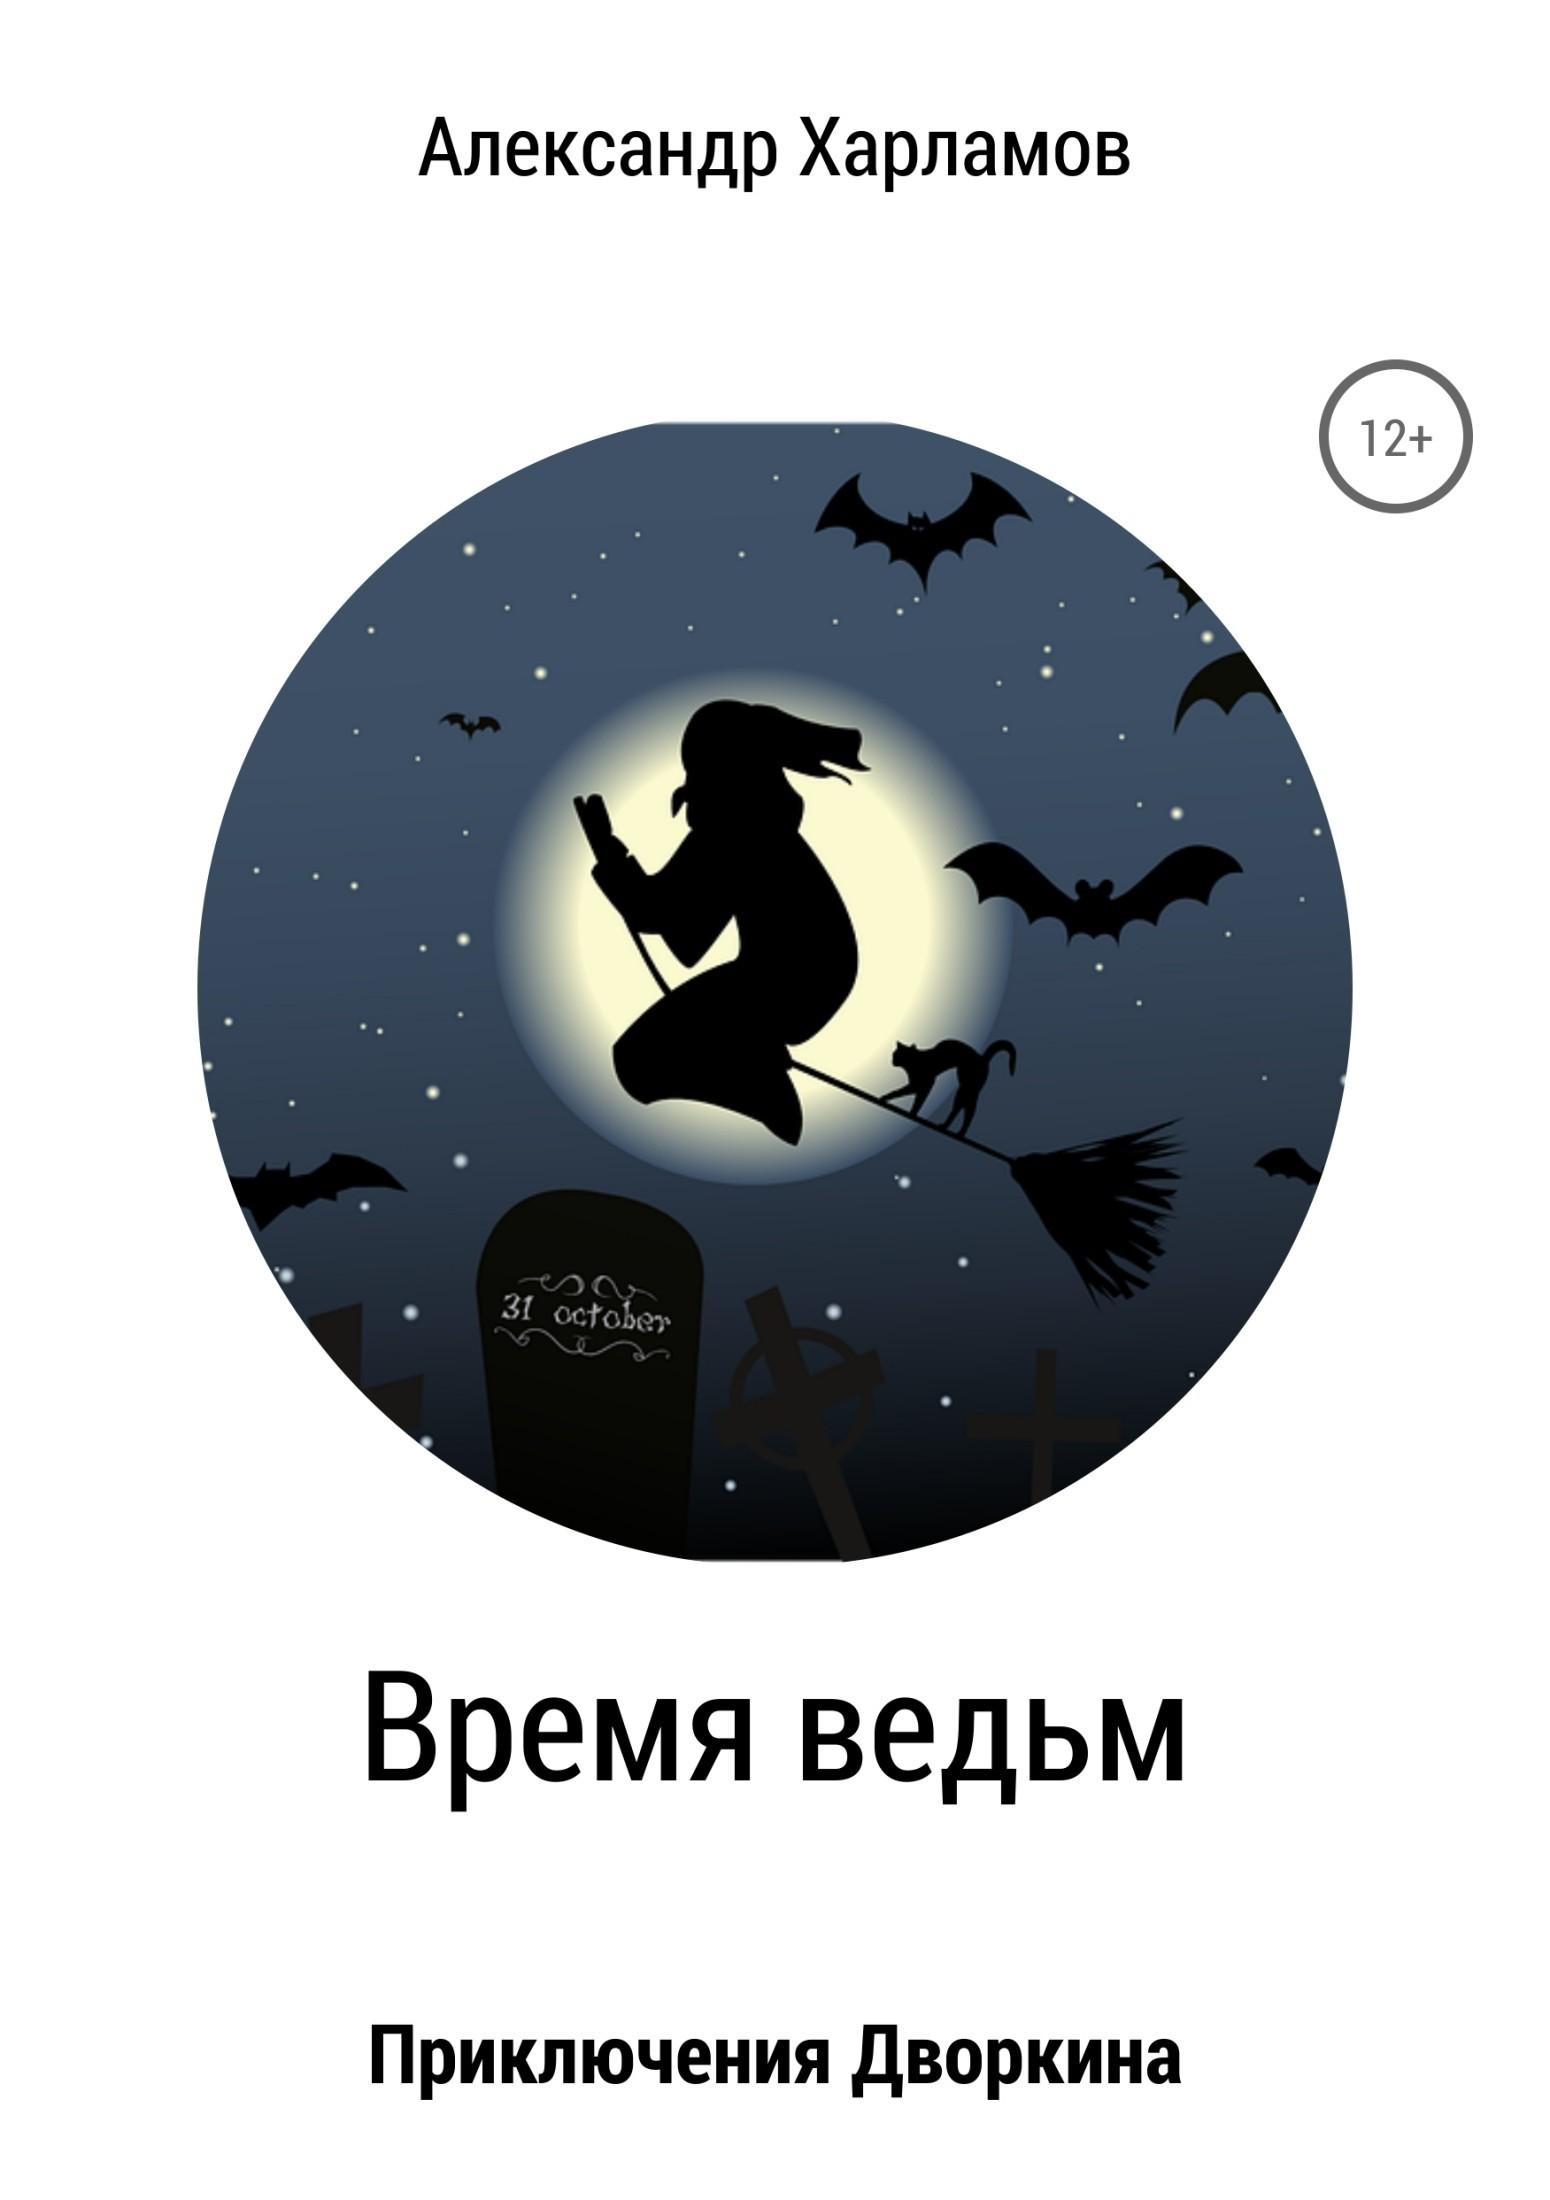 Александр Харламов. Время ведьм